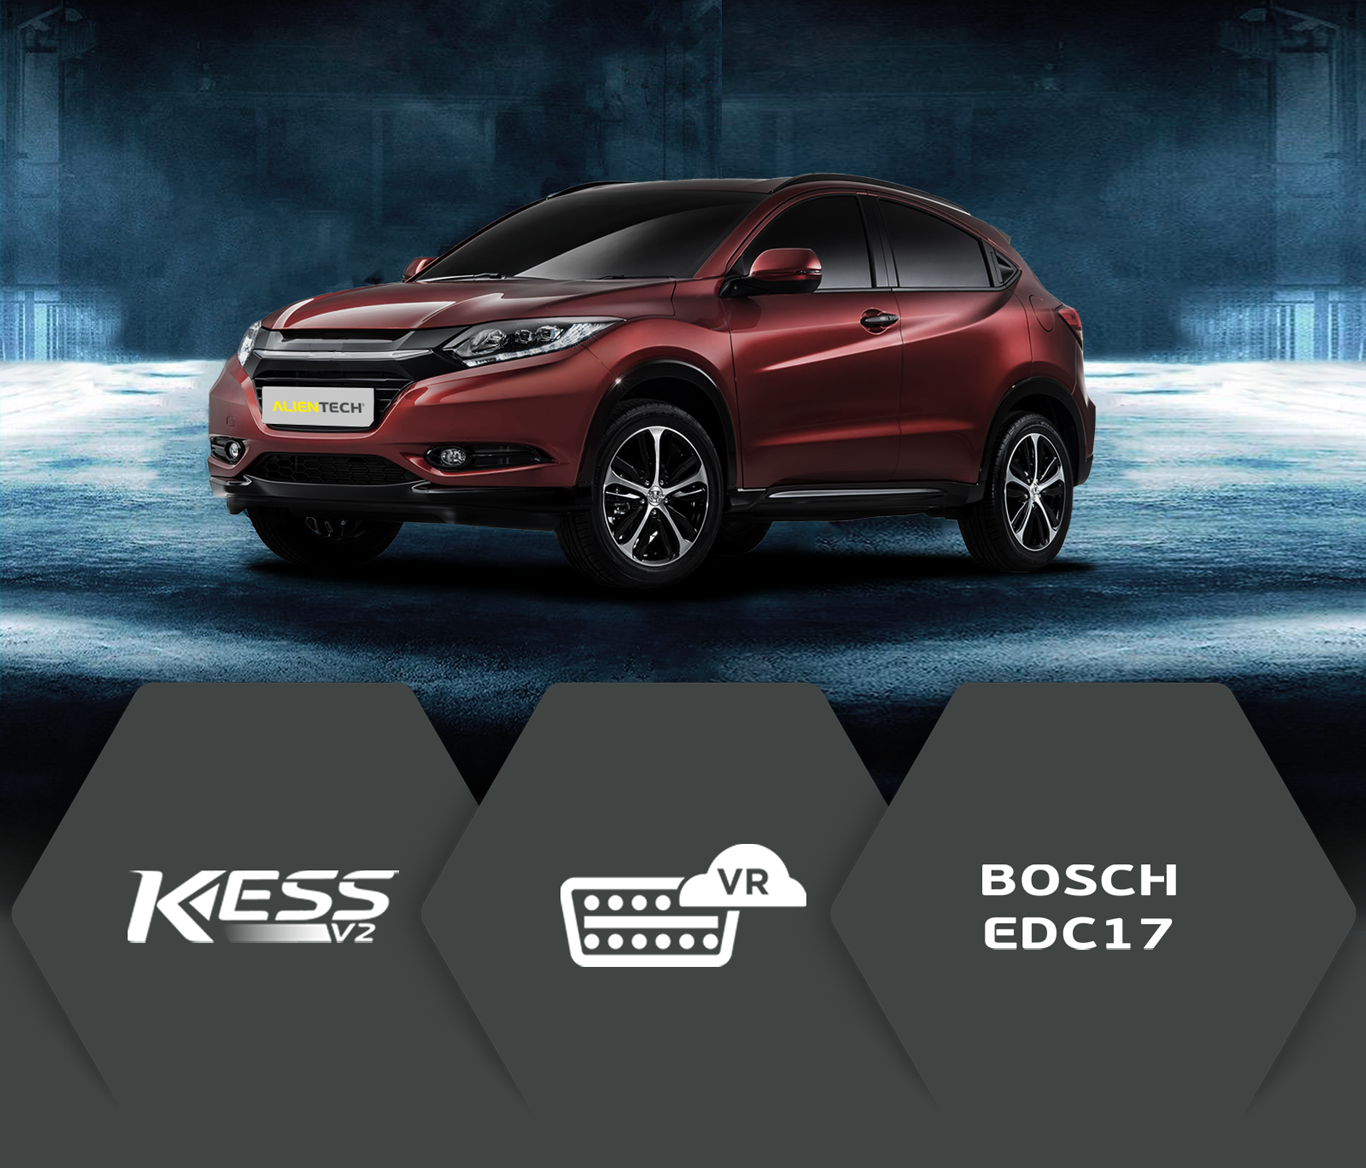 Honda ECU Bosch EDC17Honda ECU Bosch EDC17